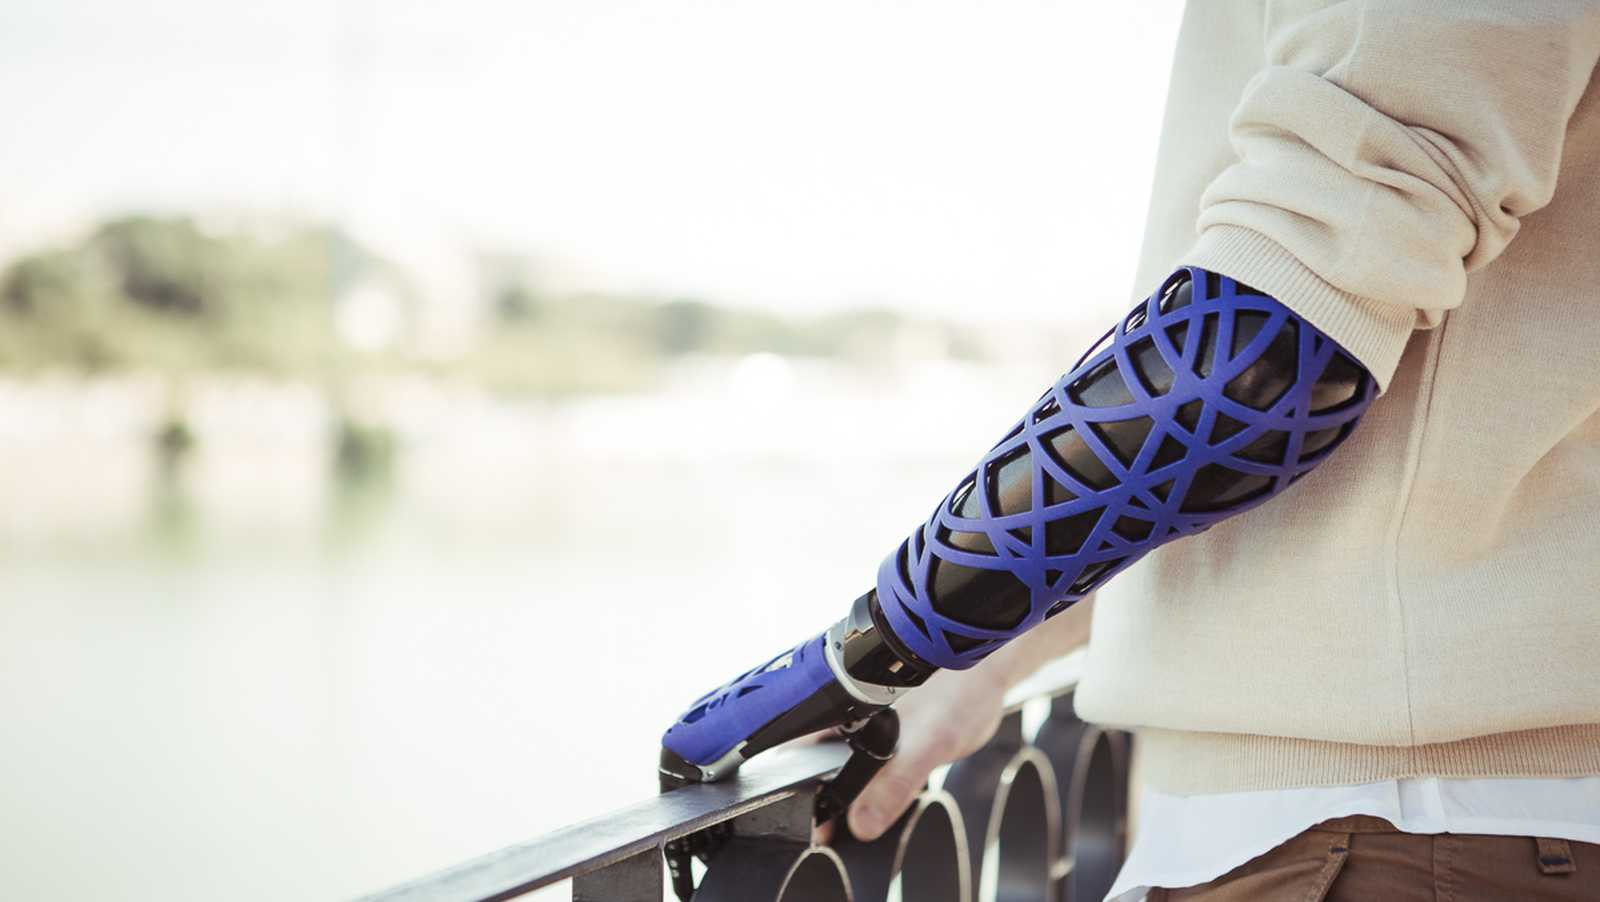 bertolt meyer with prosthetic arm